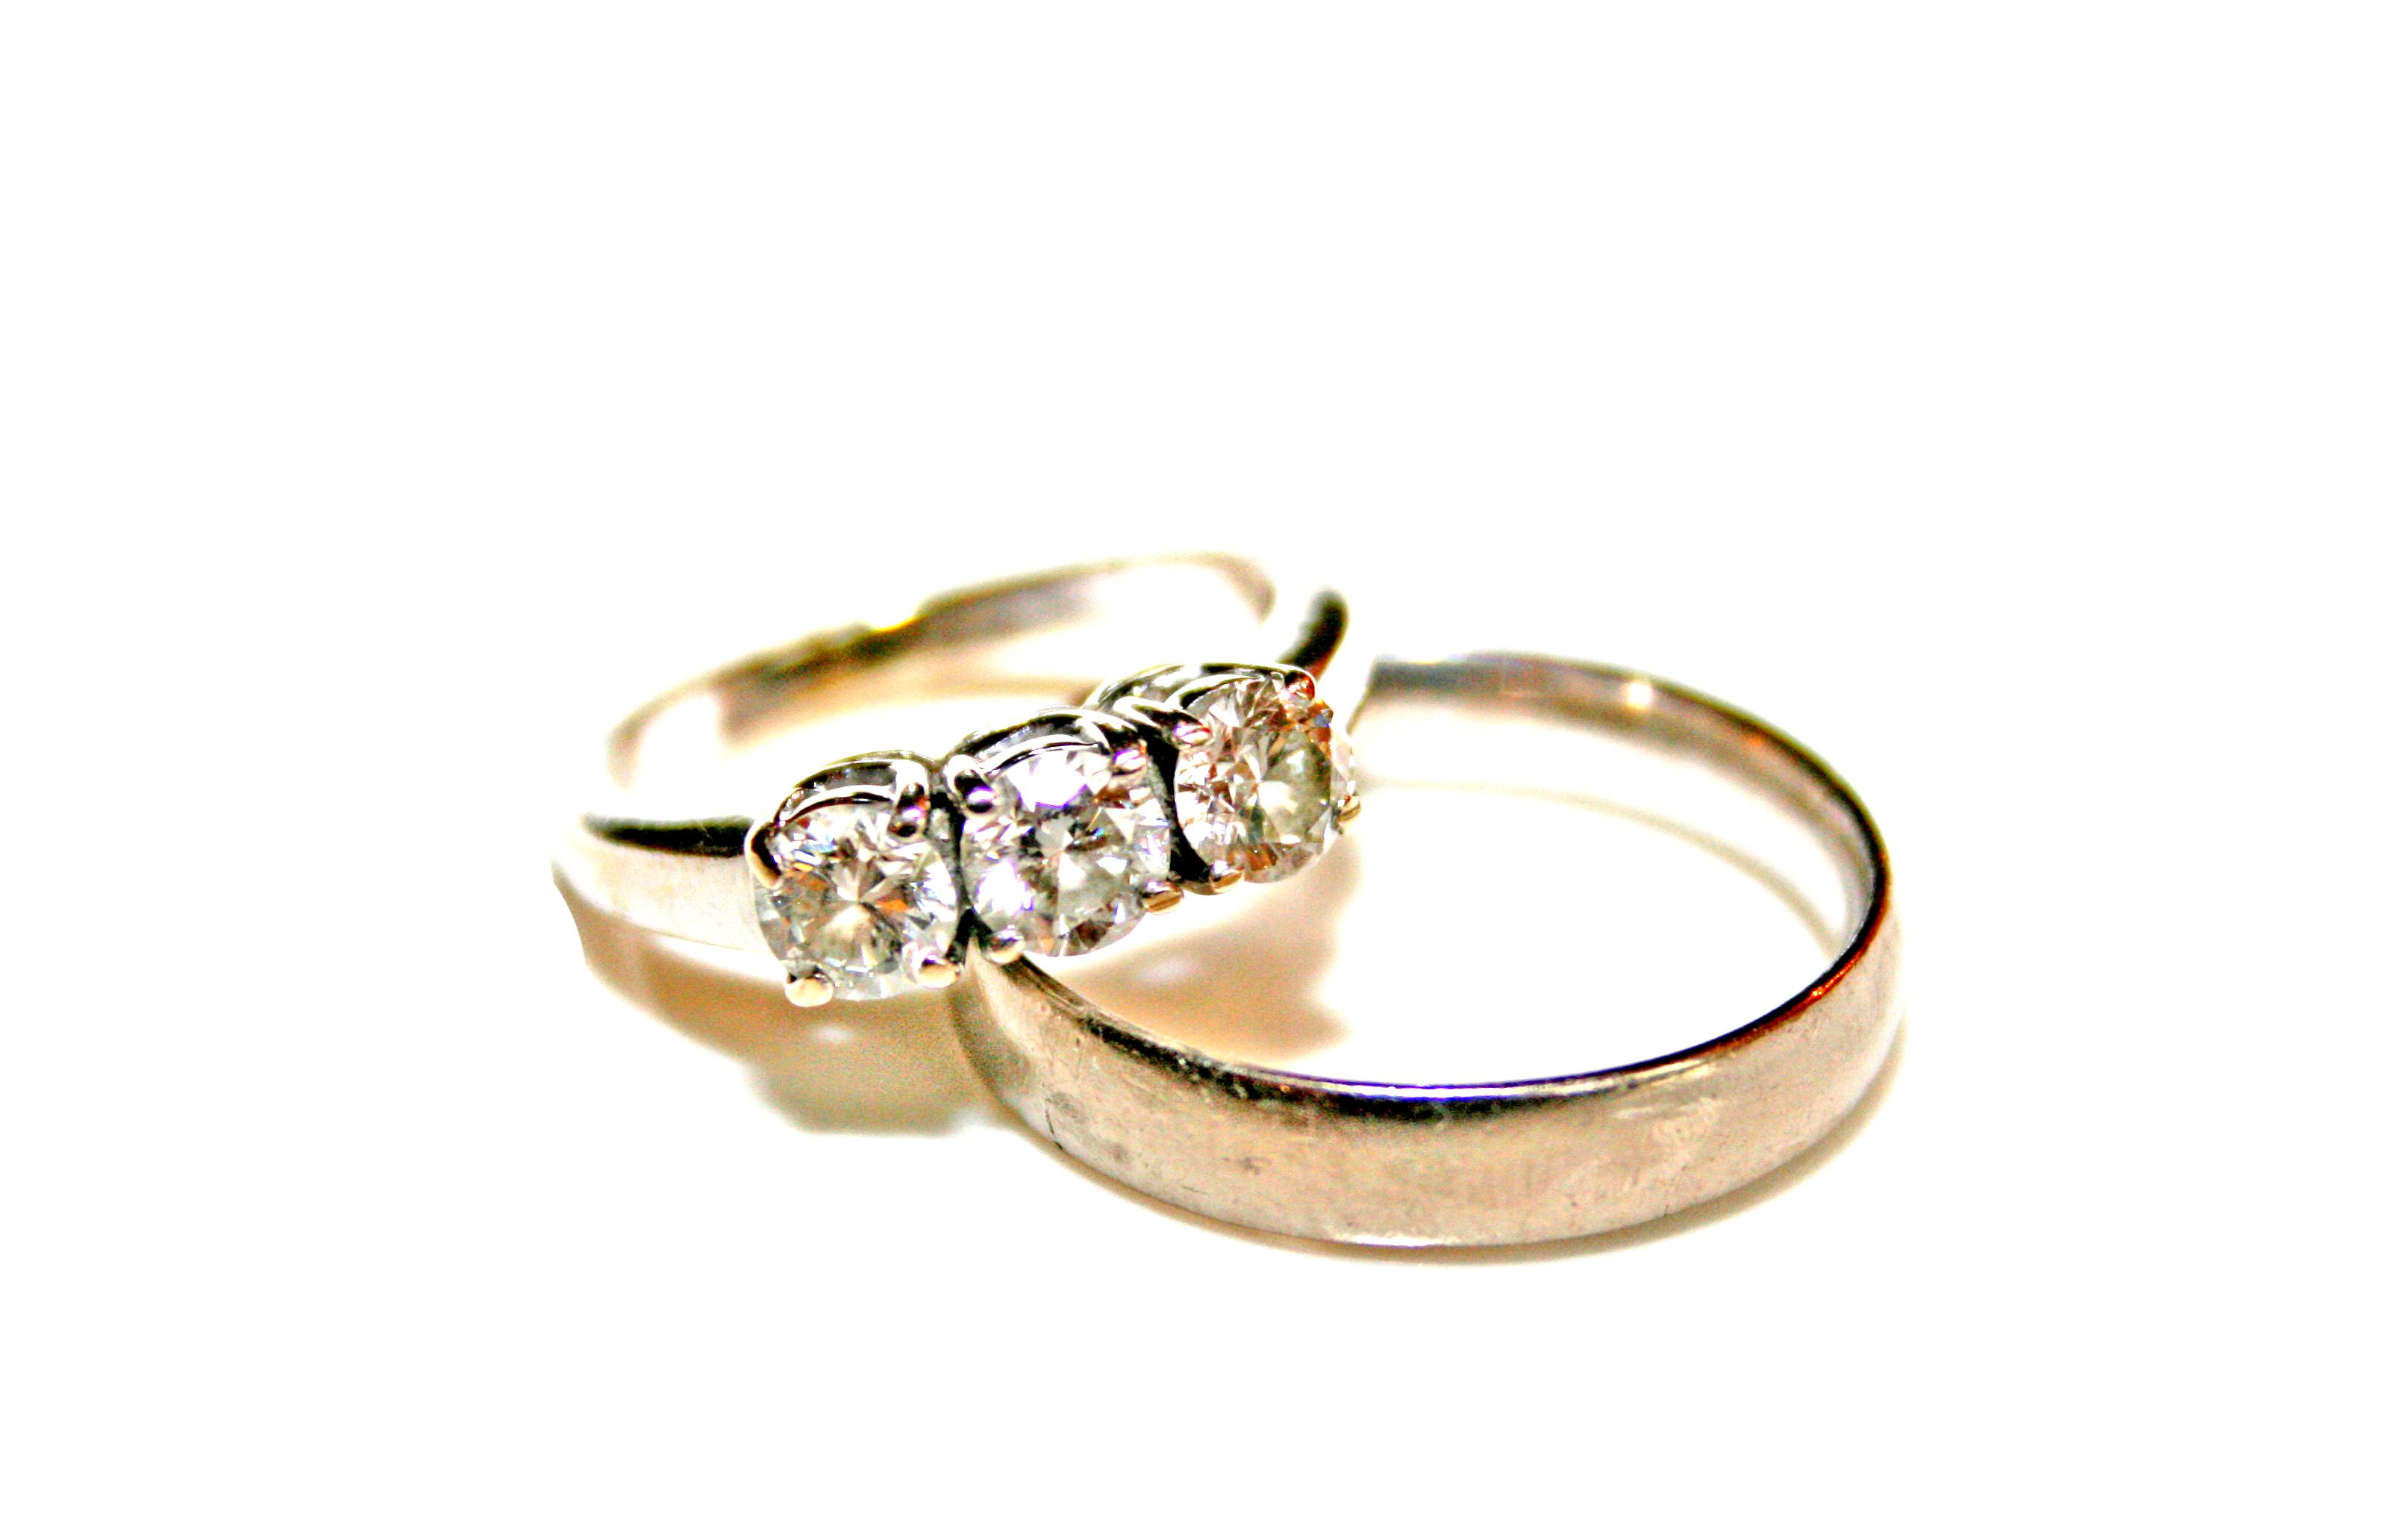 File:Wedding rings photo by Litho Printers pics of wedding rings File Wedding rings photo by Litho Printers